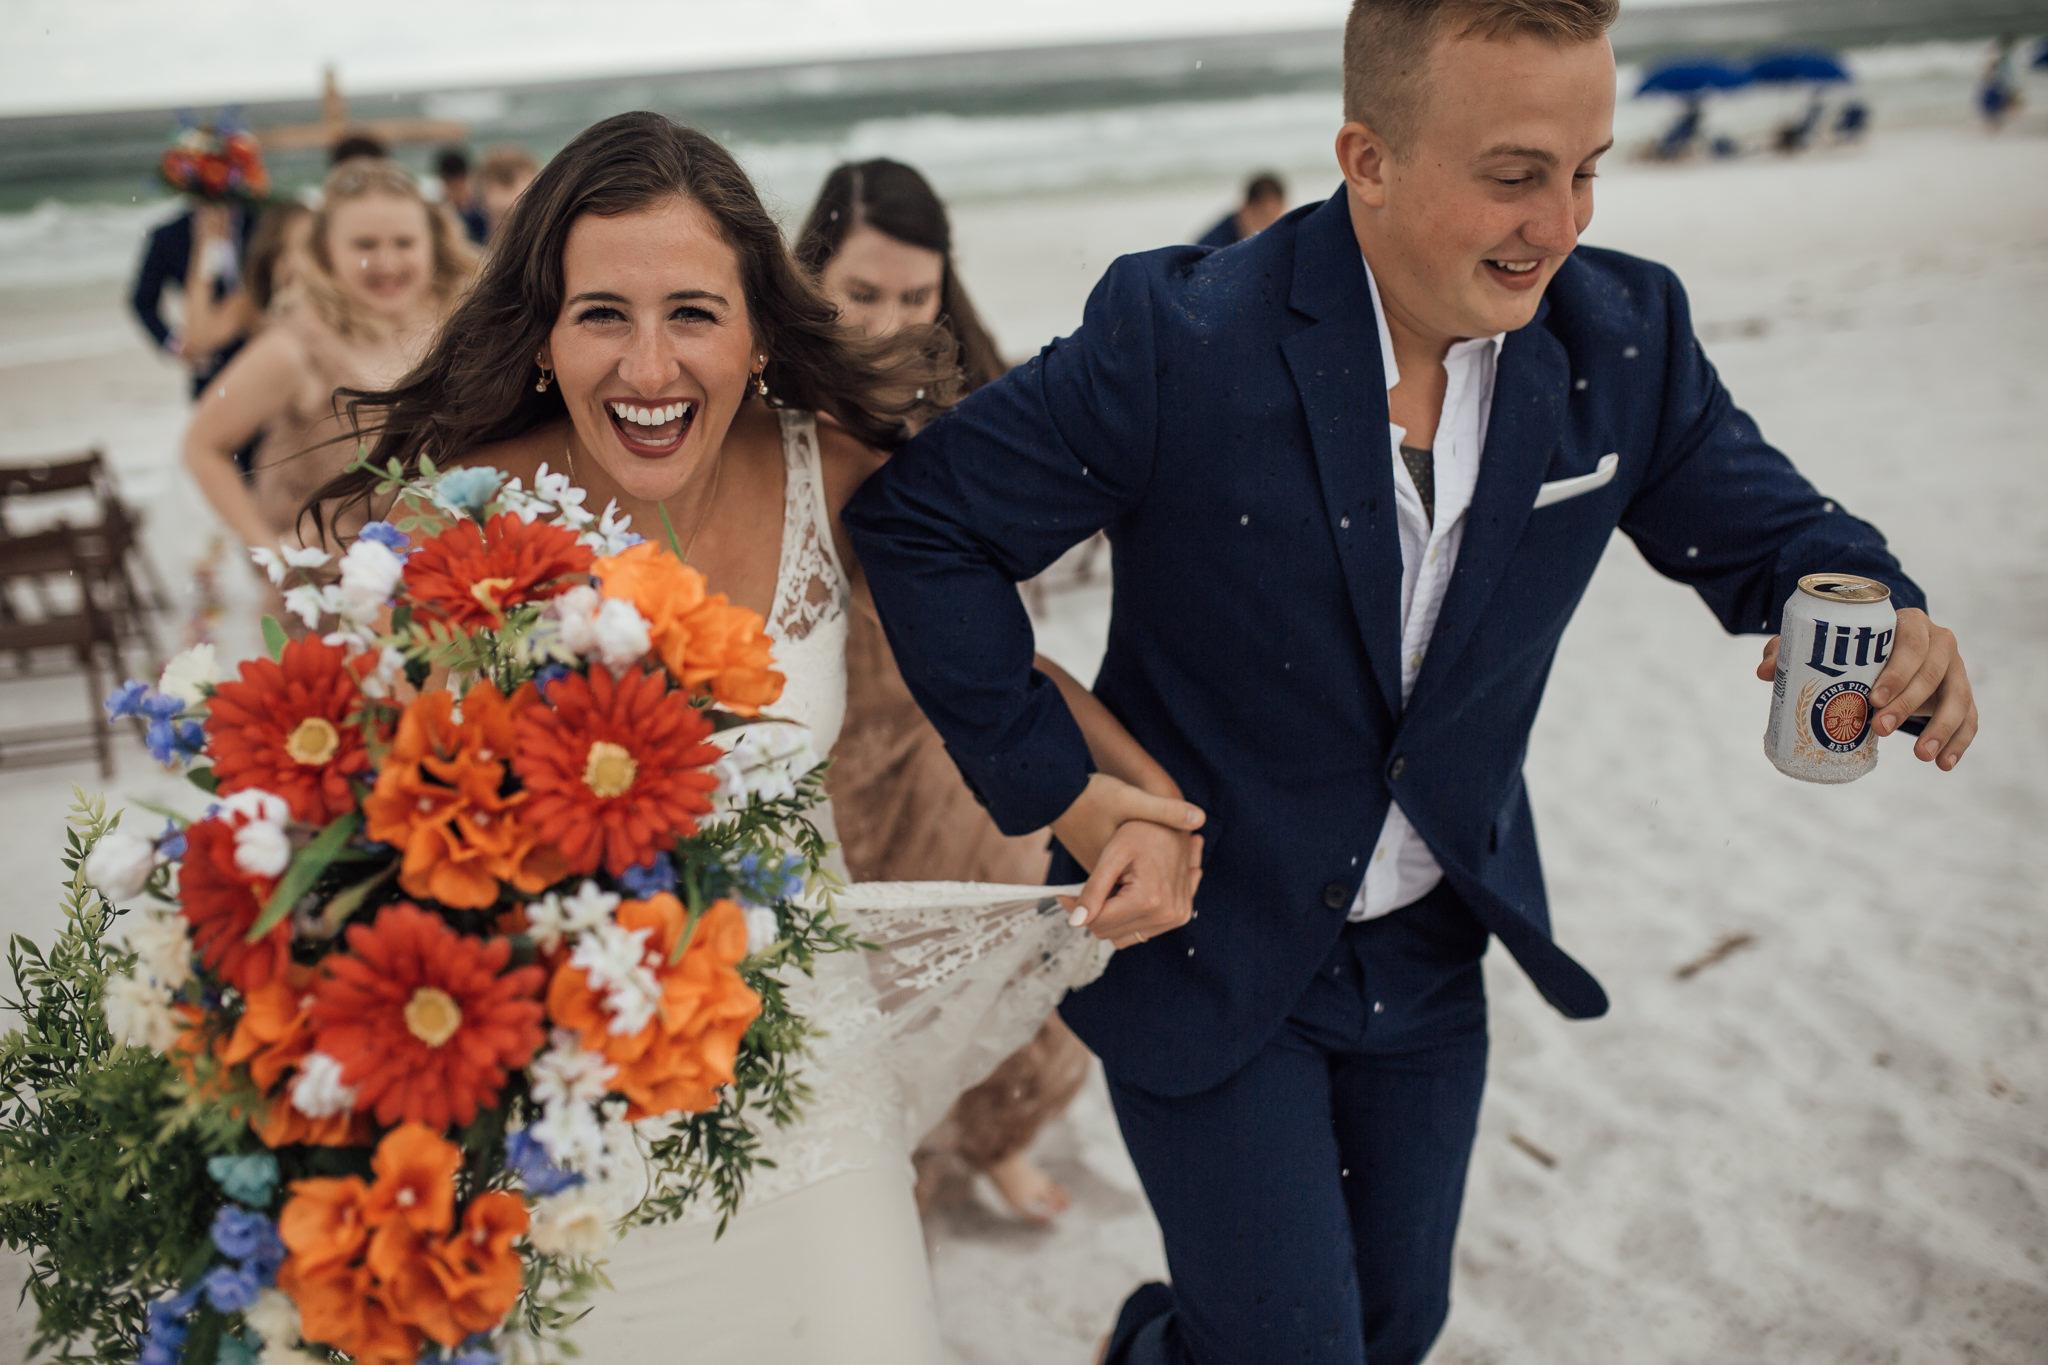 cassie-cook-photography-santa-rosa-beach-fl-wedding-farrar-wedding-beach-wedding-destination-wedding-6-2.jpg